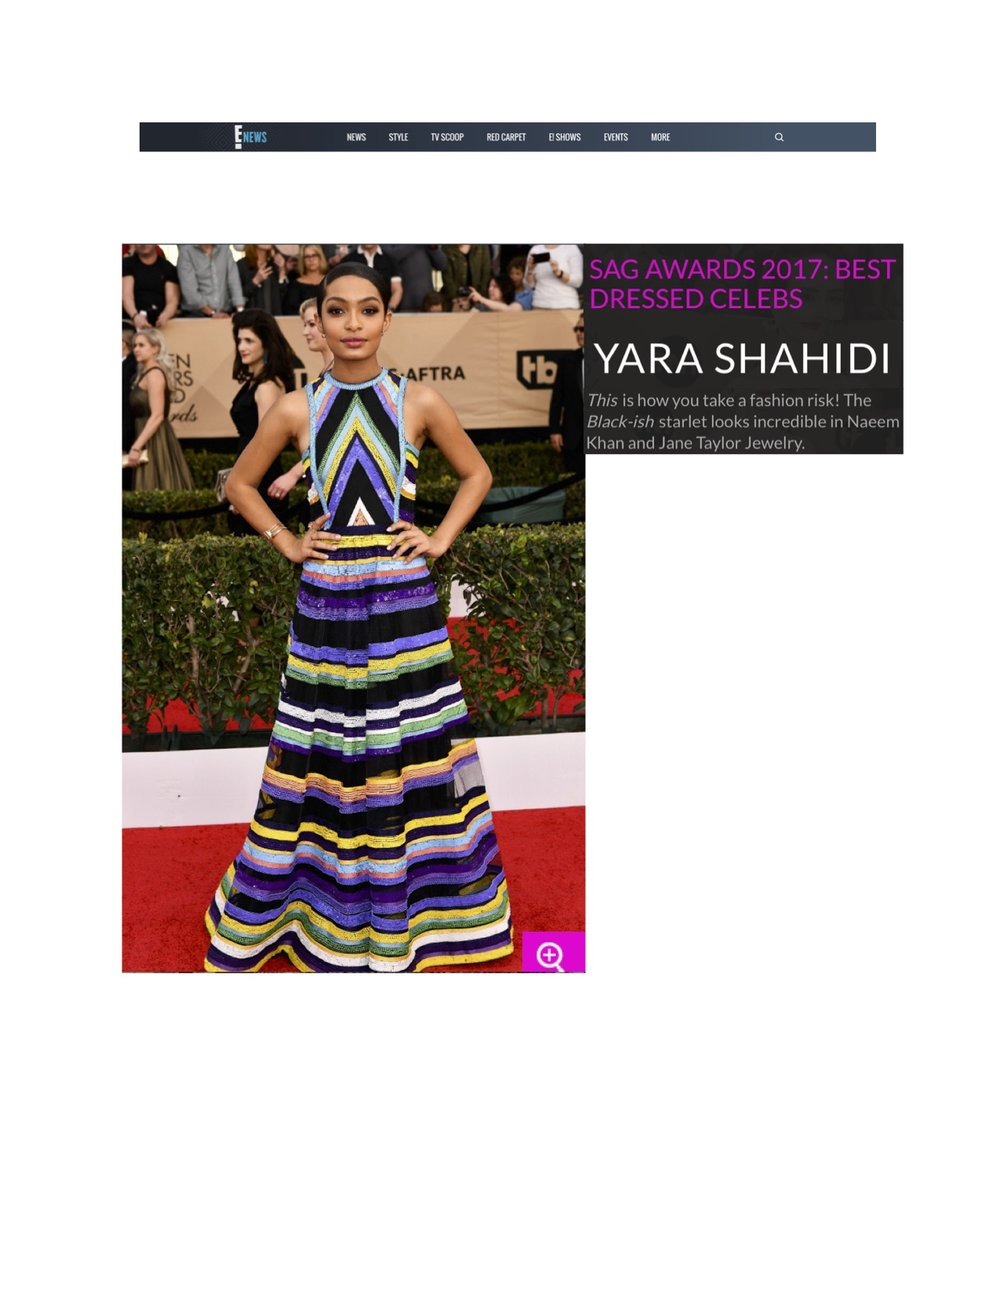 Yara Shahidi in Jane Taylor Earrings, Rings, and Bracelet at the 2017 SAG Awards - EOnline.com